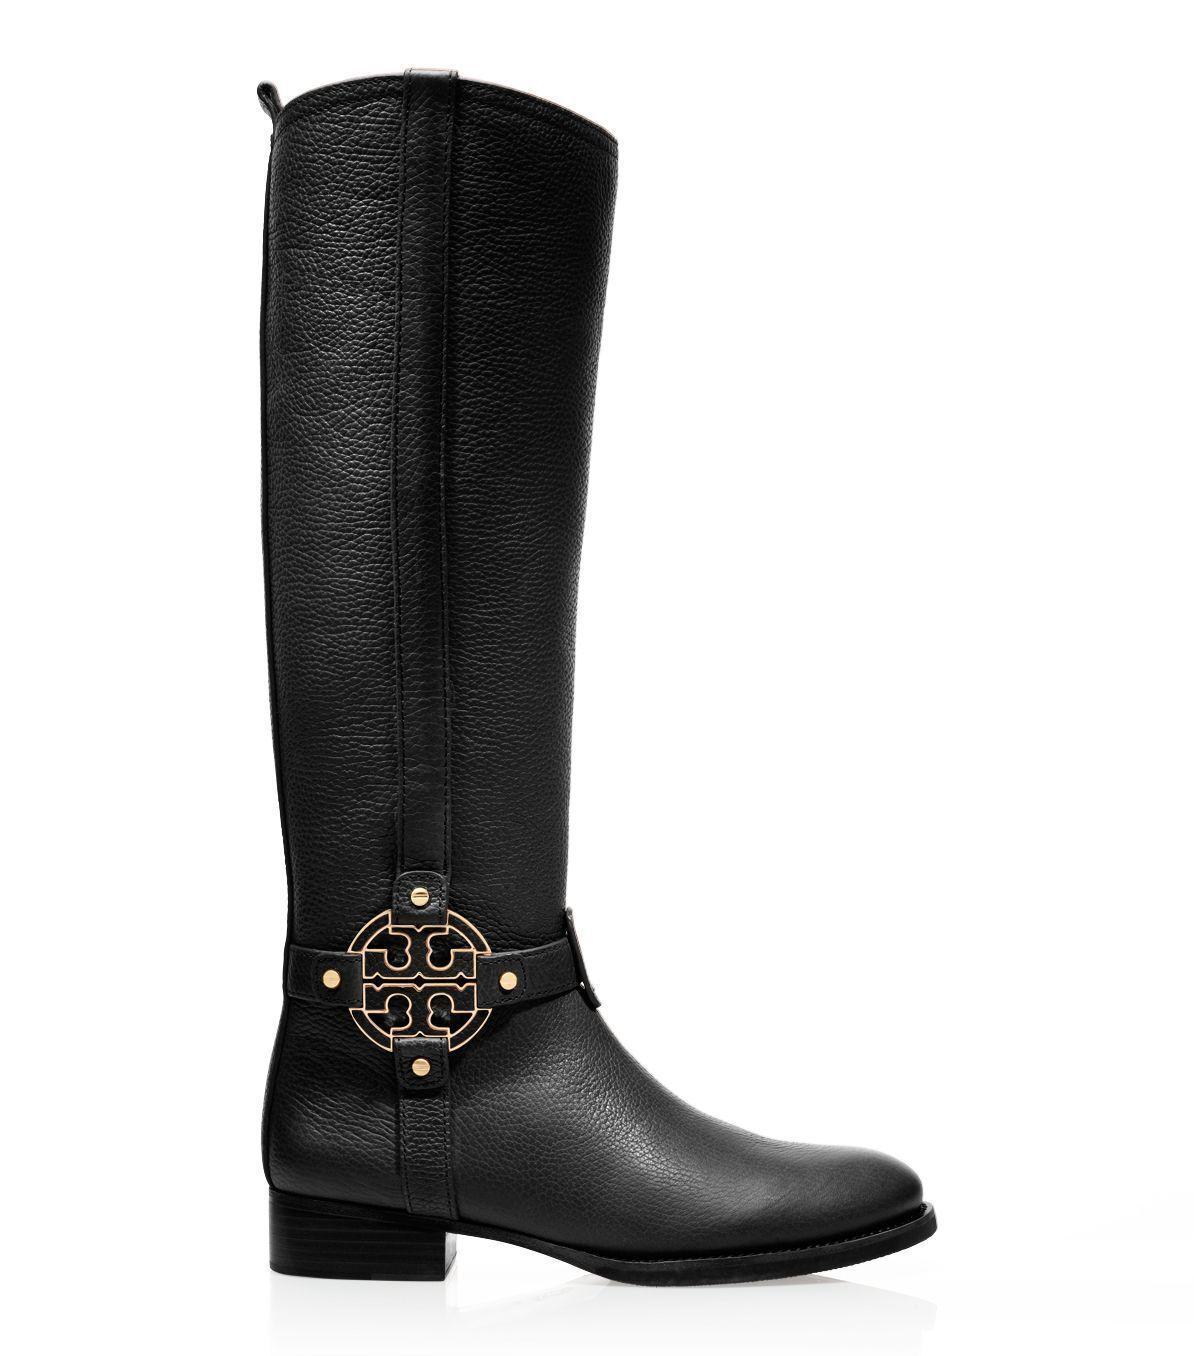 Tory Burch Amanda Tall Flat Riding Stiefel BLACK Leder SZ 5 NEW